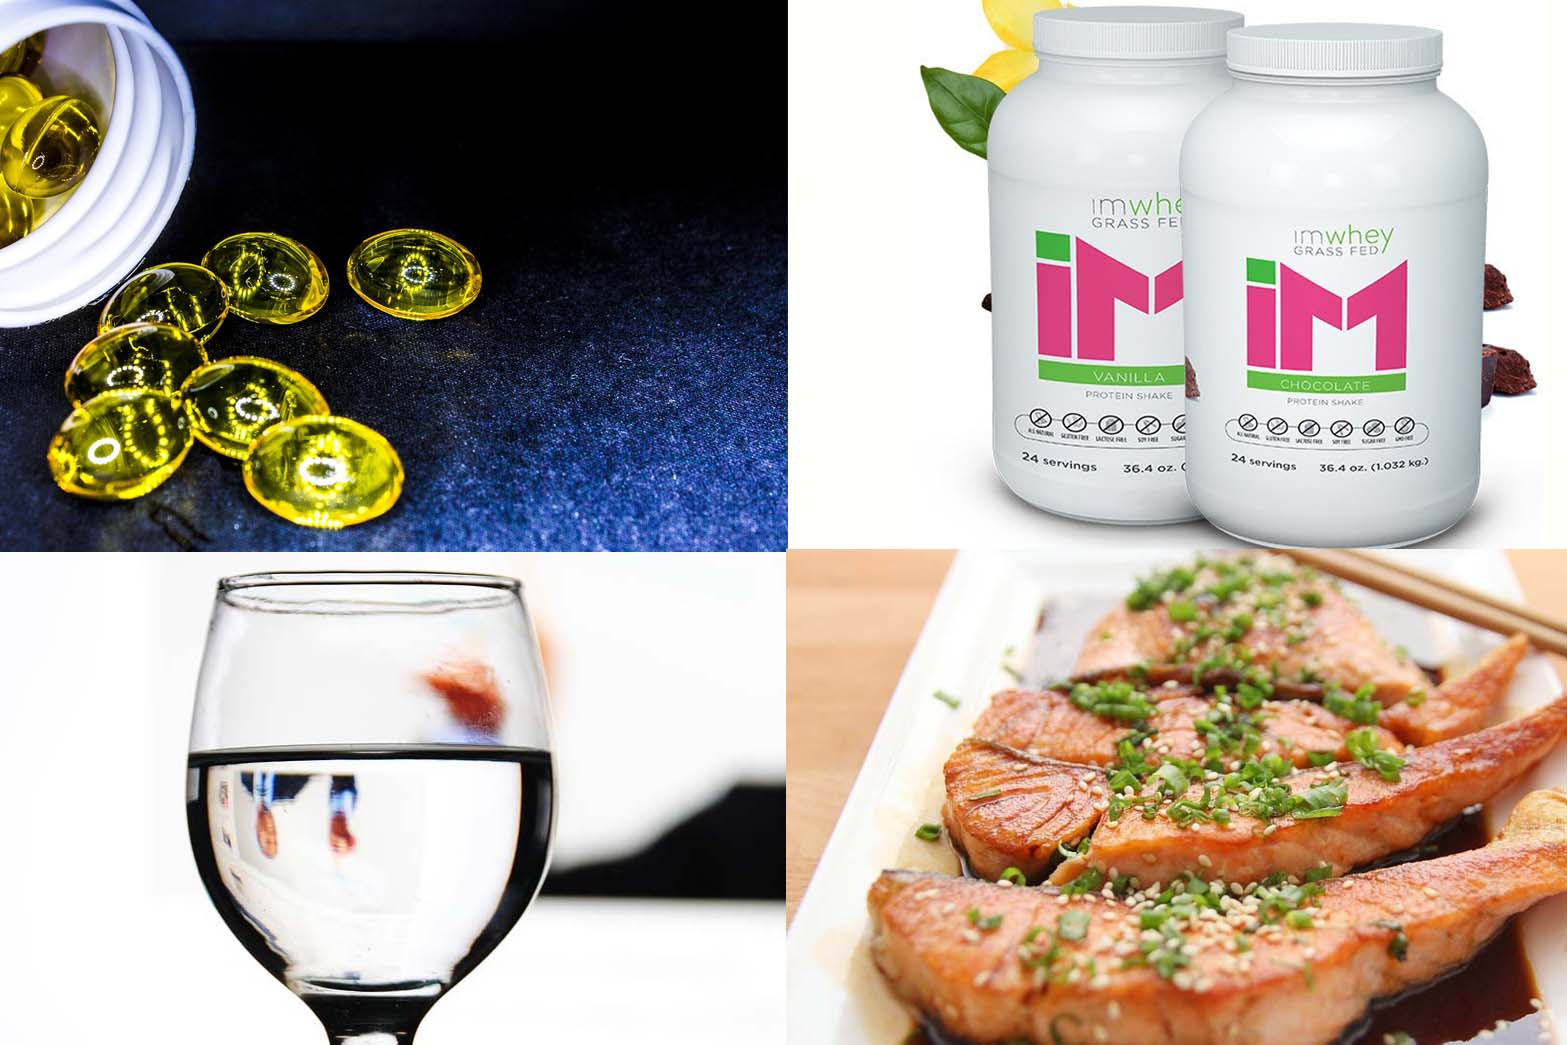 recetas naturales para eliminar grasa abdominal